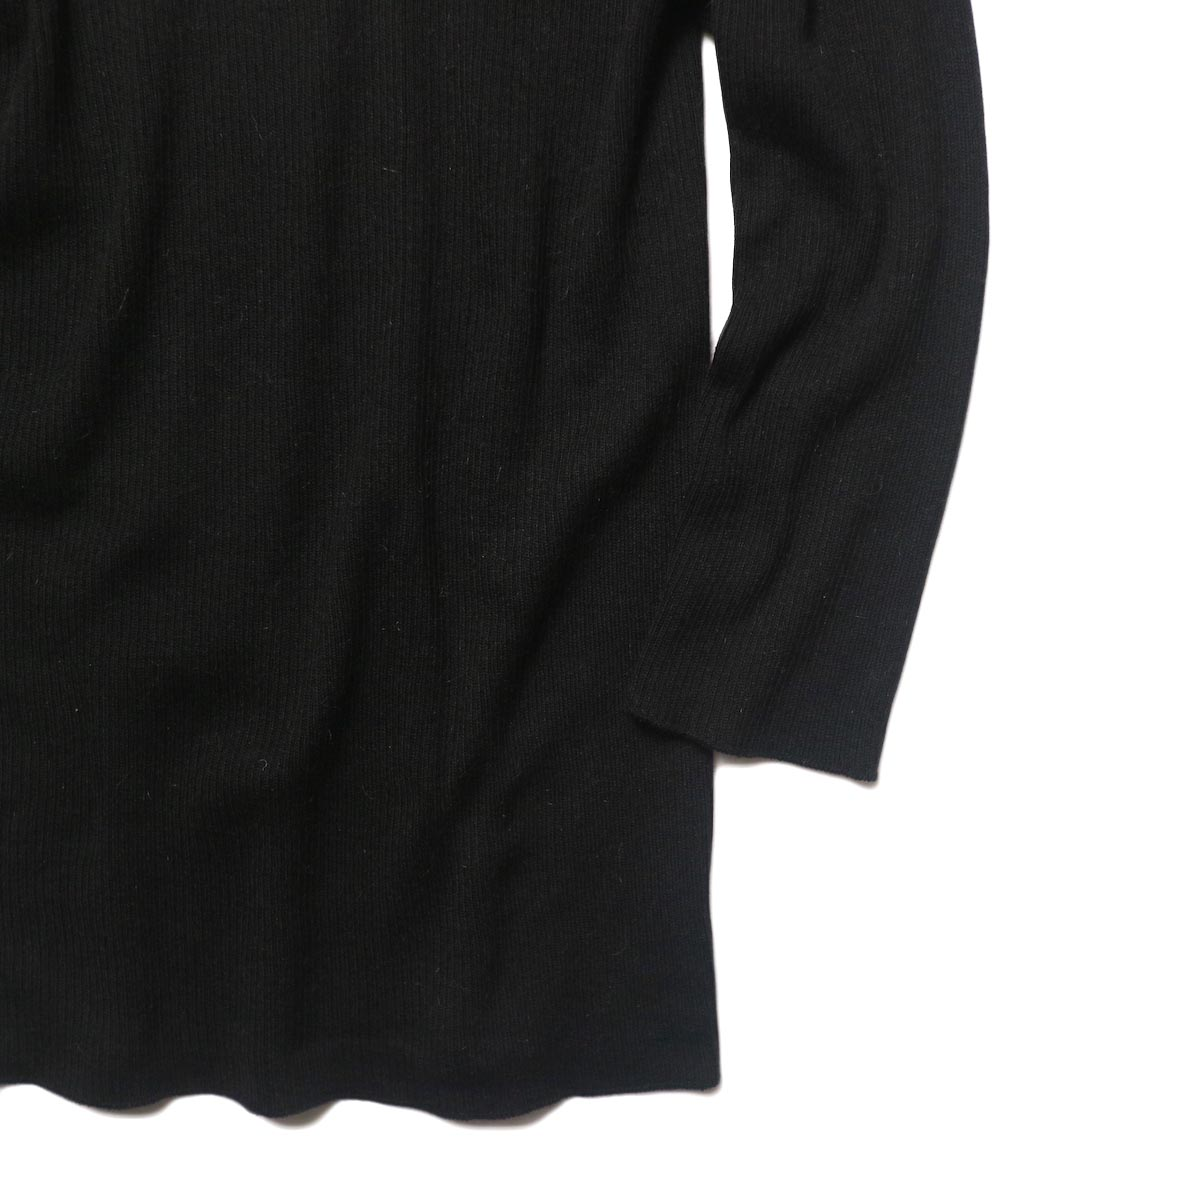 BLUEBIRD BOULEVARD Cotton & Angora Wide Turtleneck Sweater (black) 袖・裾